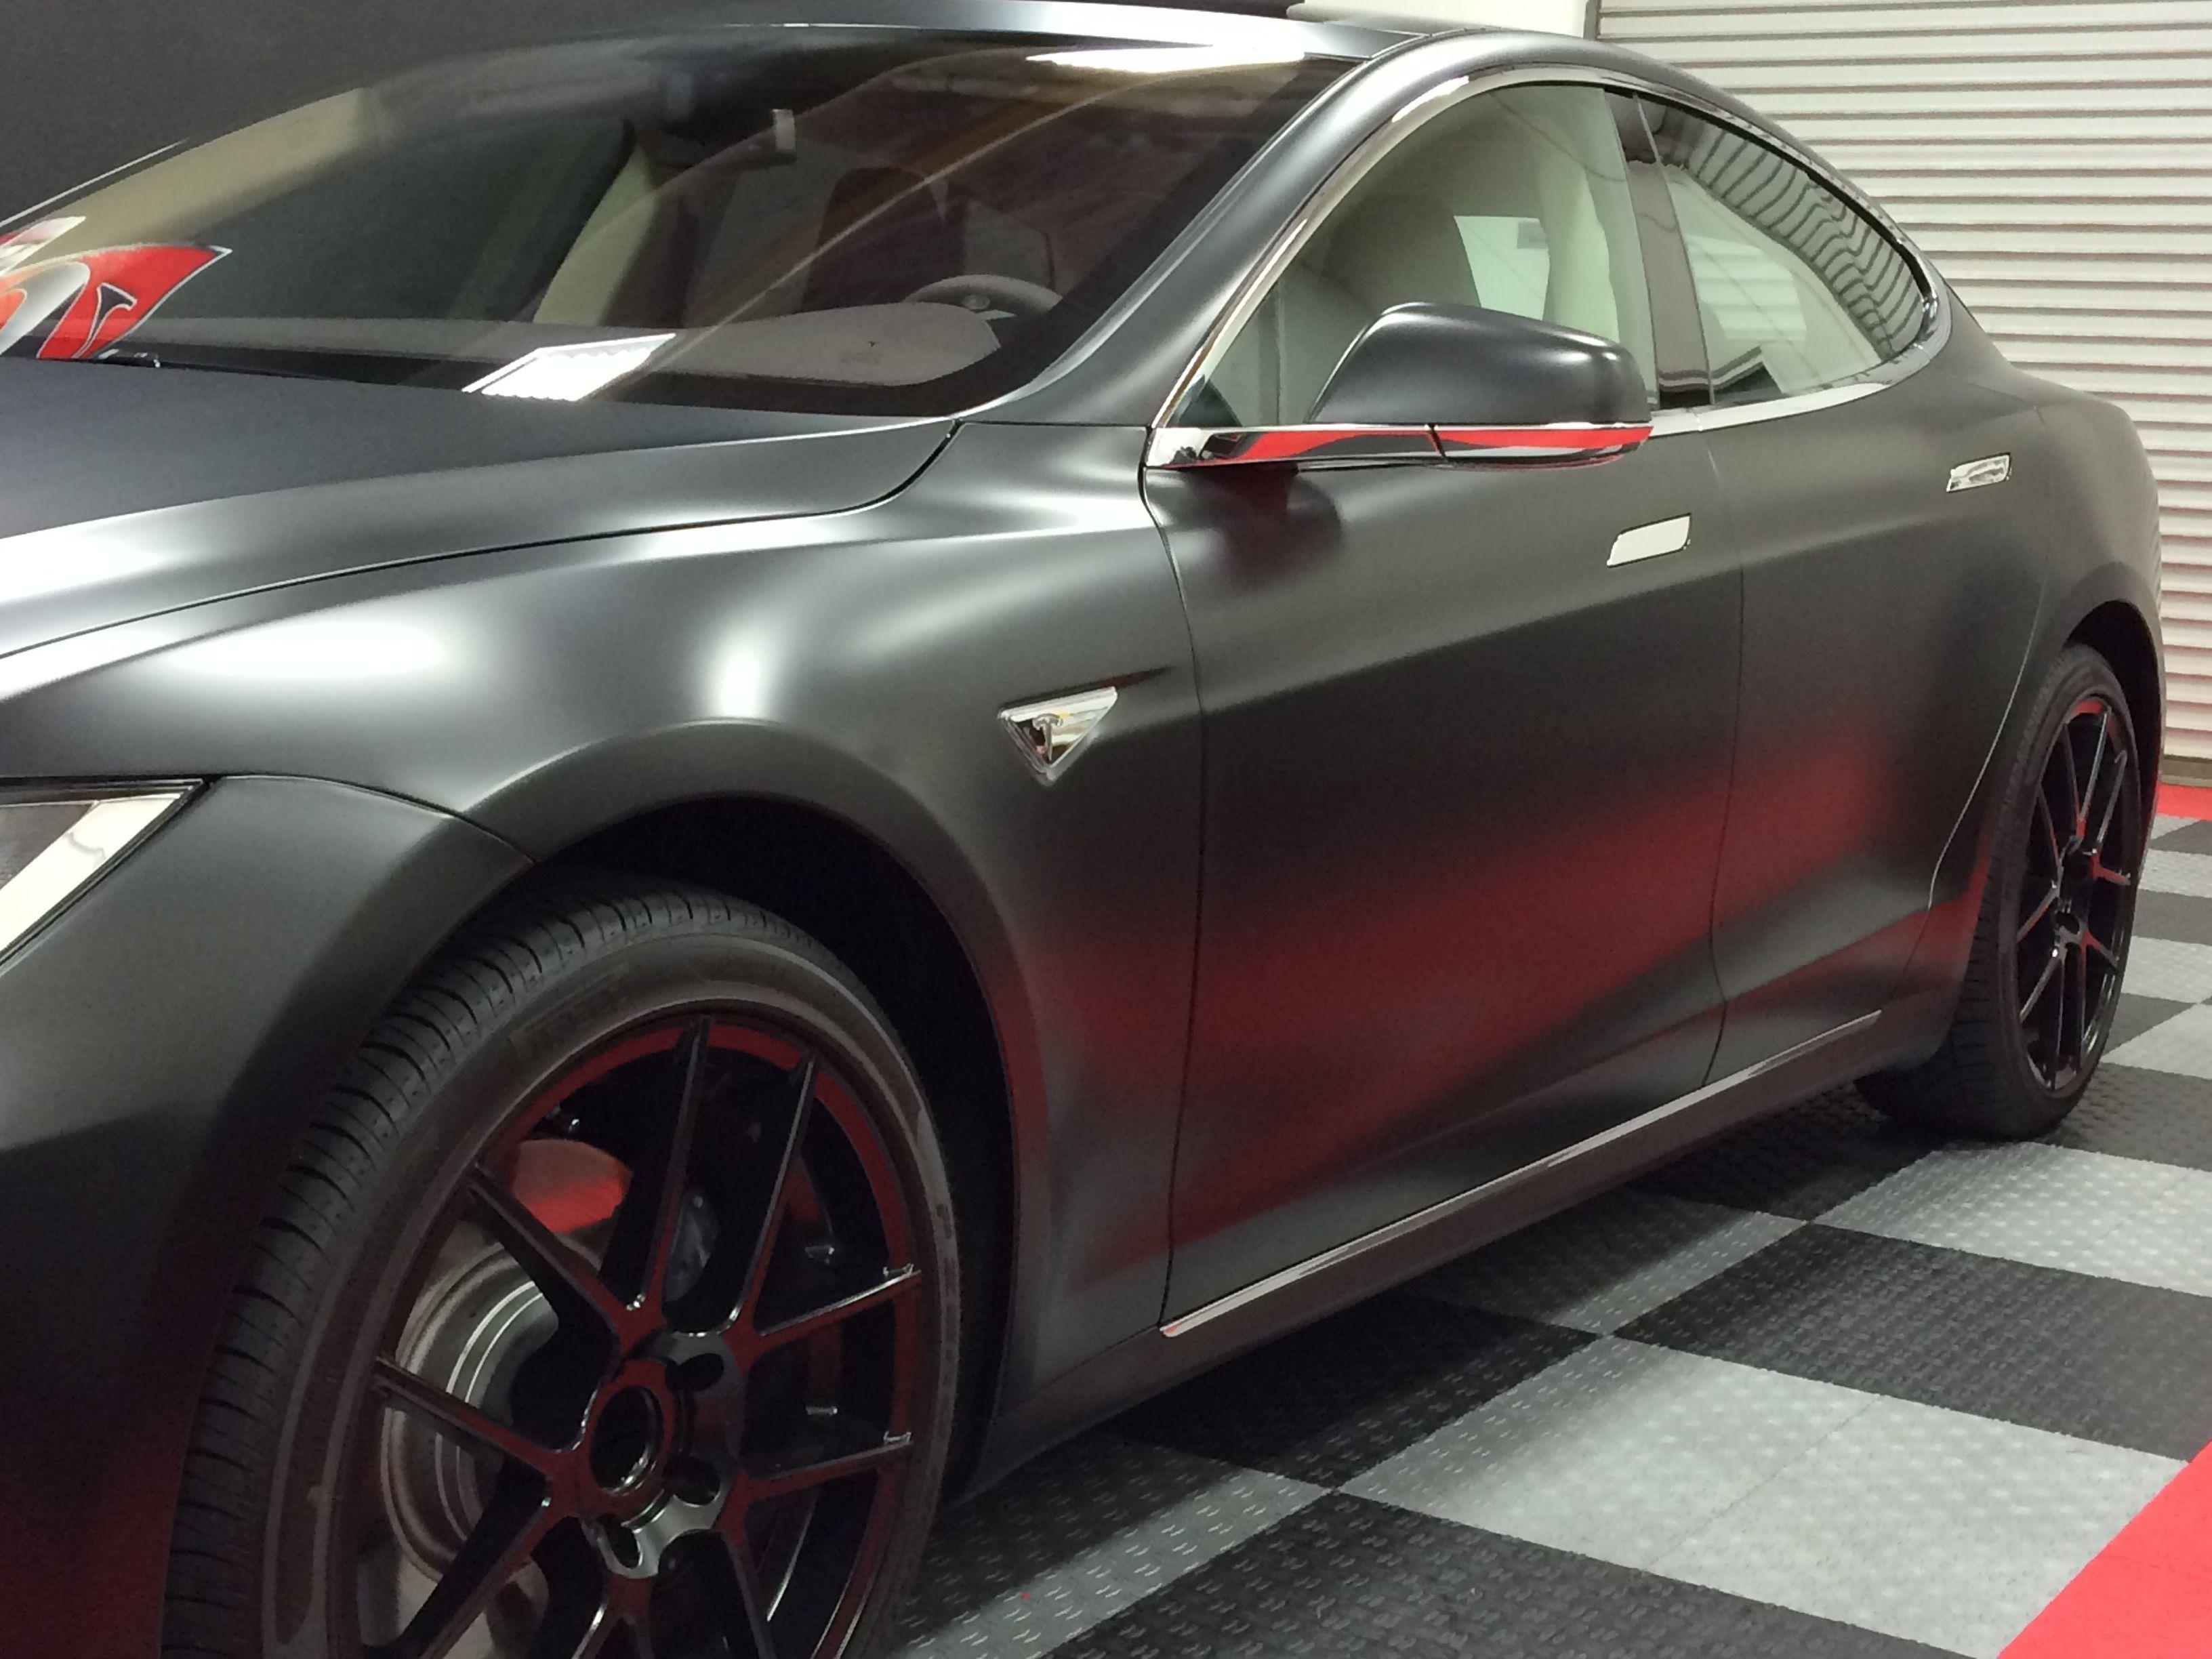 Matte Finish Paint >> Tesla Model S Full Car Matte Finish Paint Protection Wrap